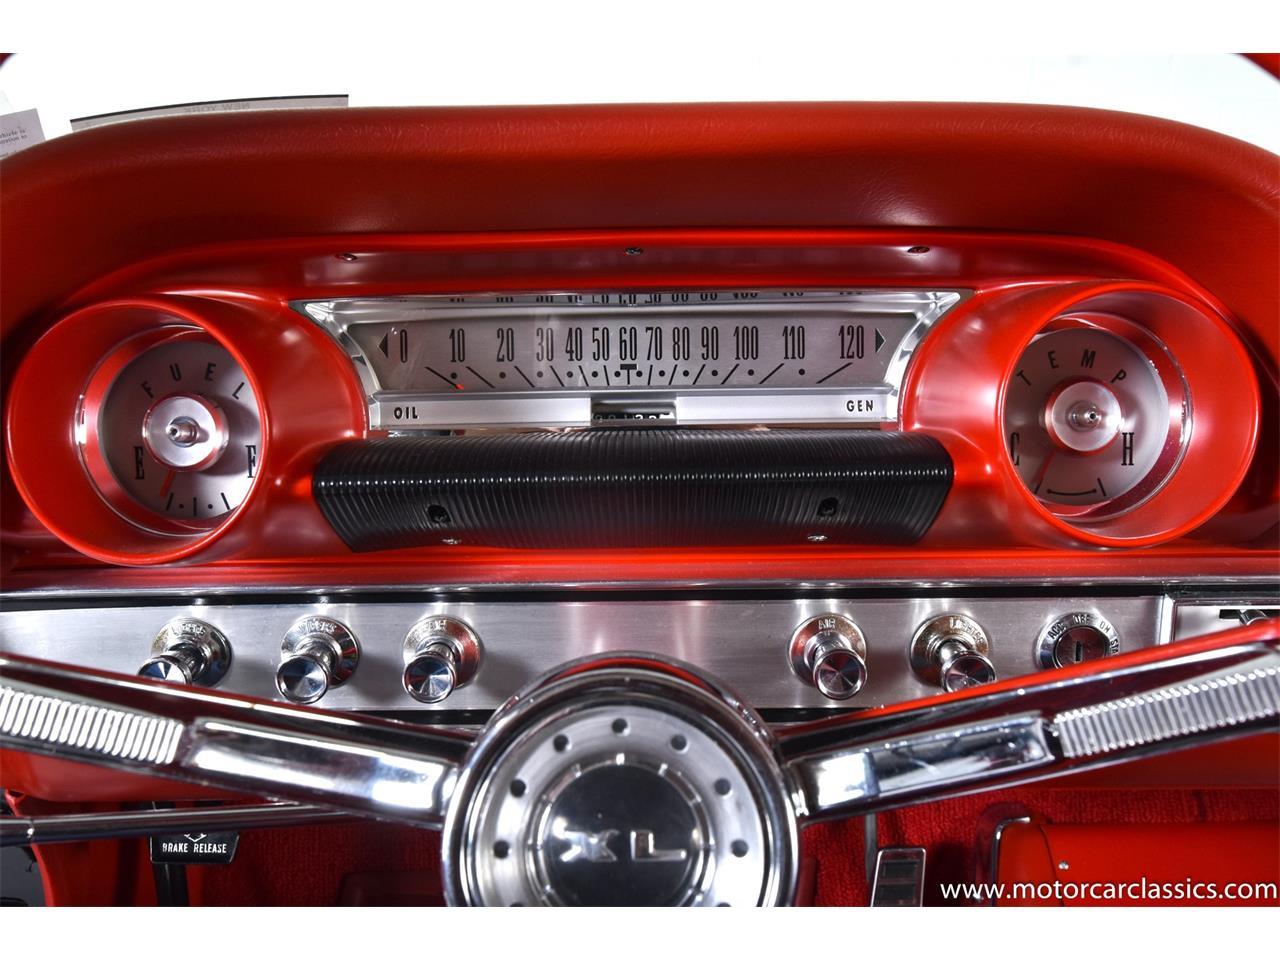 1964 Ford Galaxie (CC-1414472) for sale in Farmingdale, New York